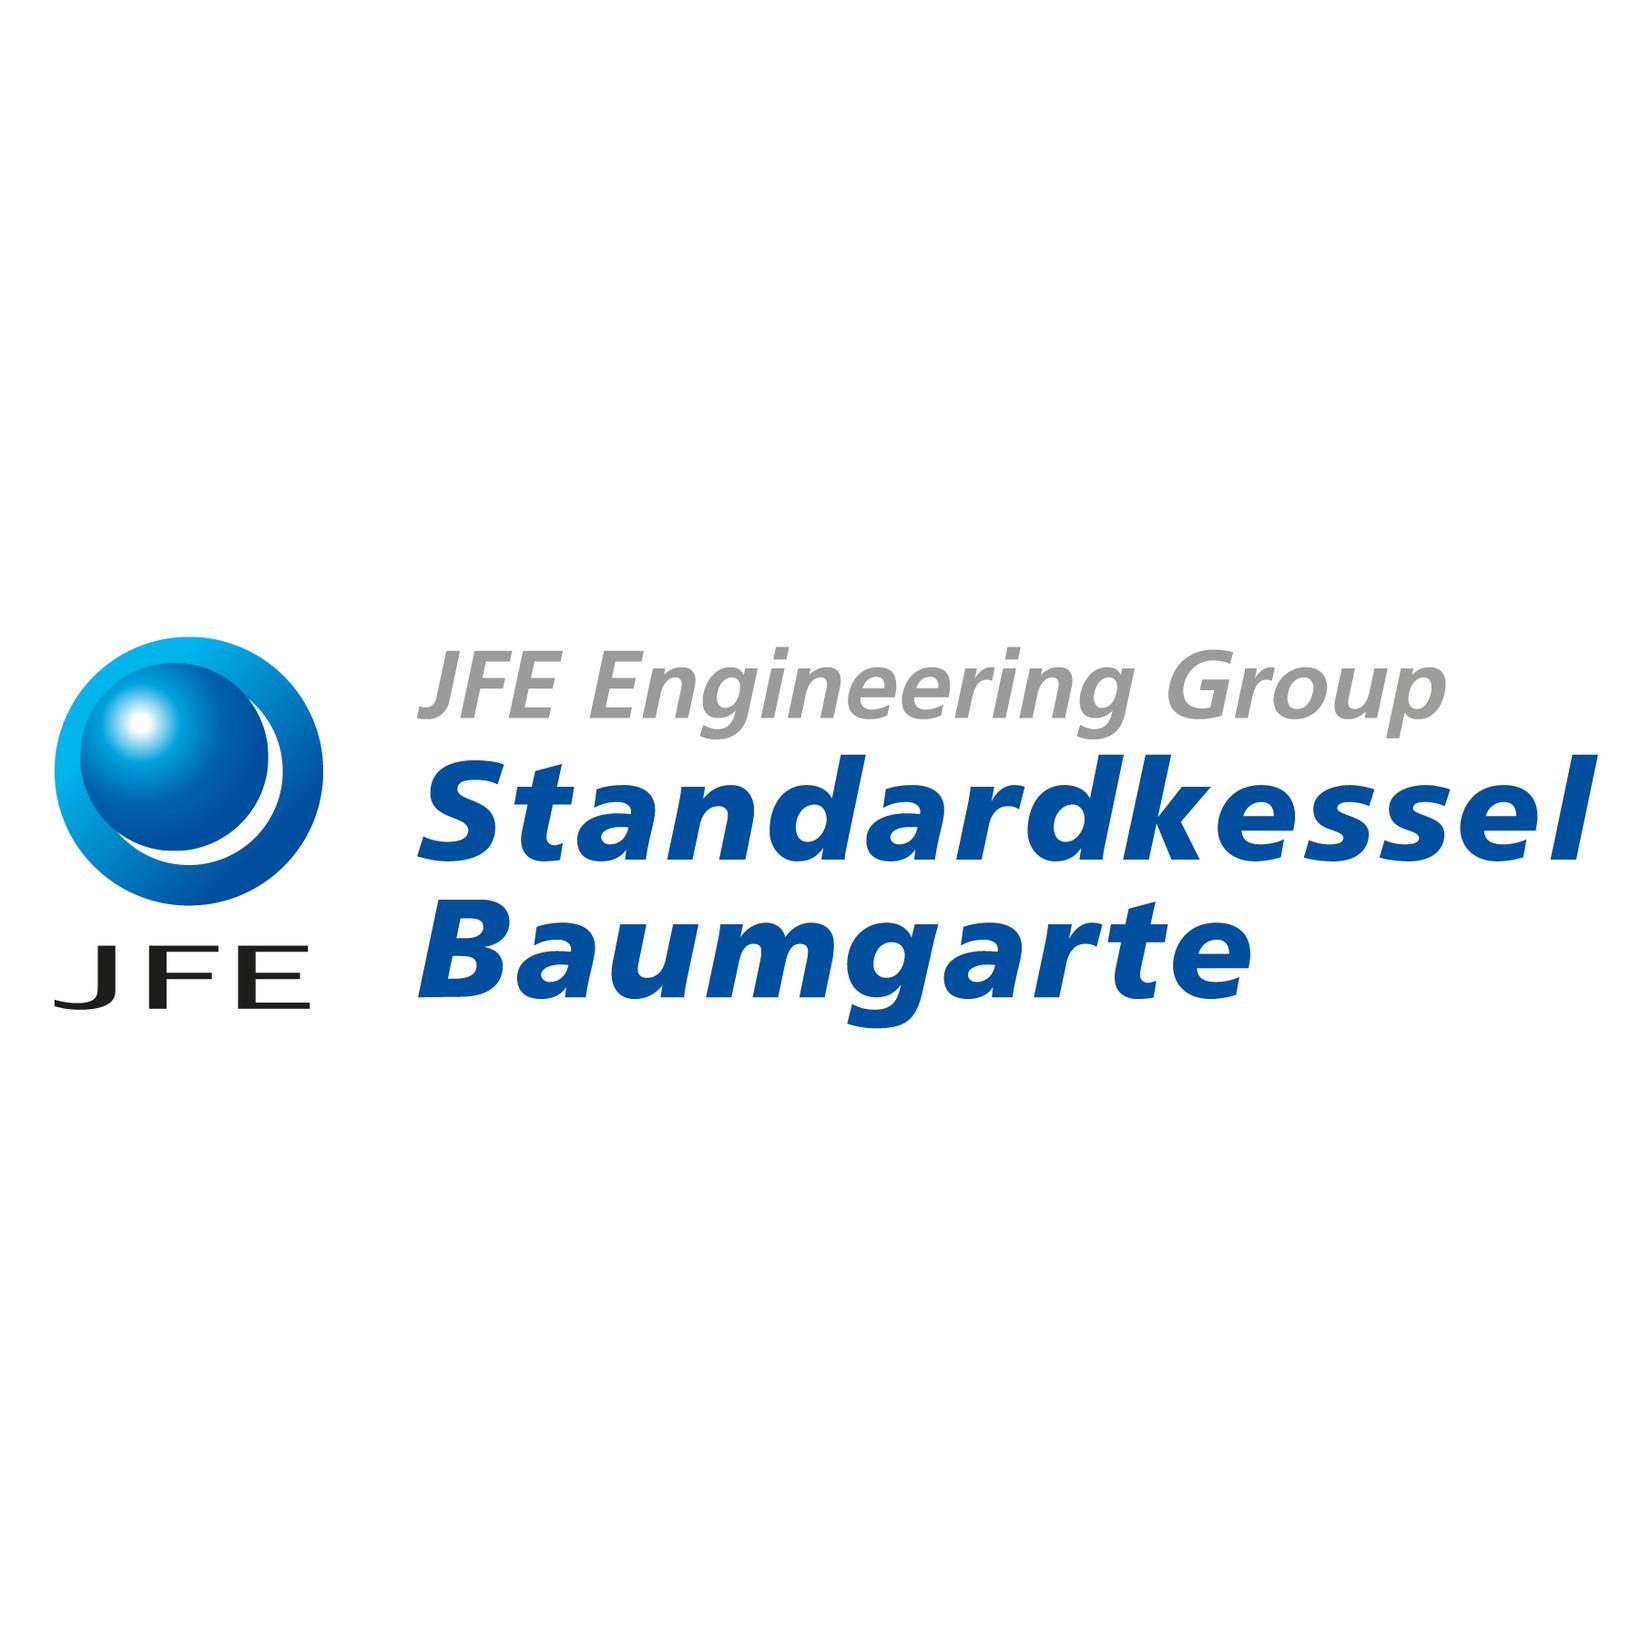 Company logo of Standardkessel Baumgarte GmbH